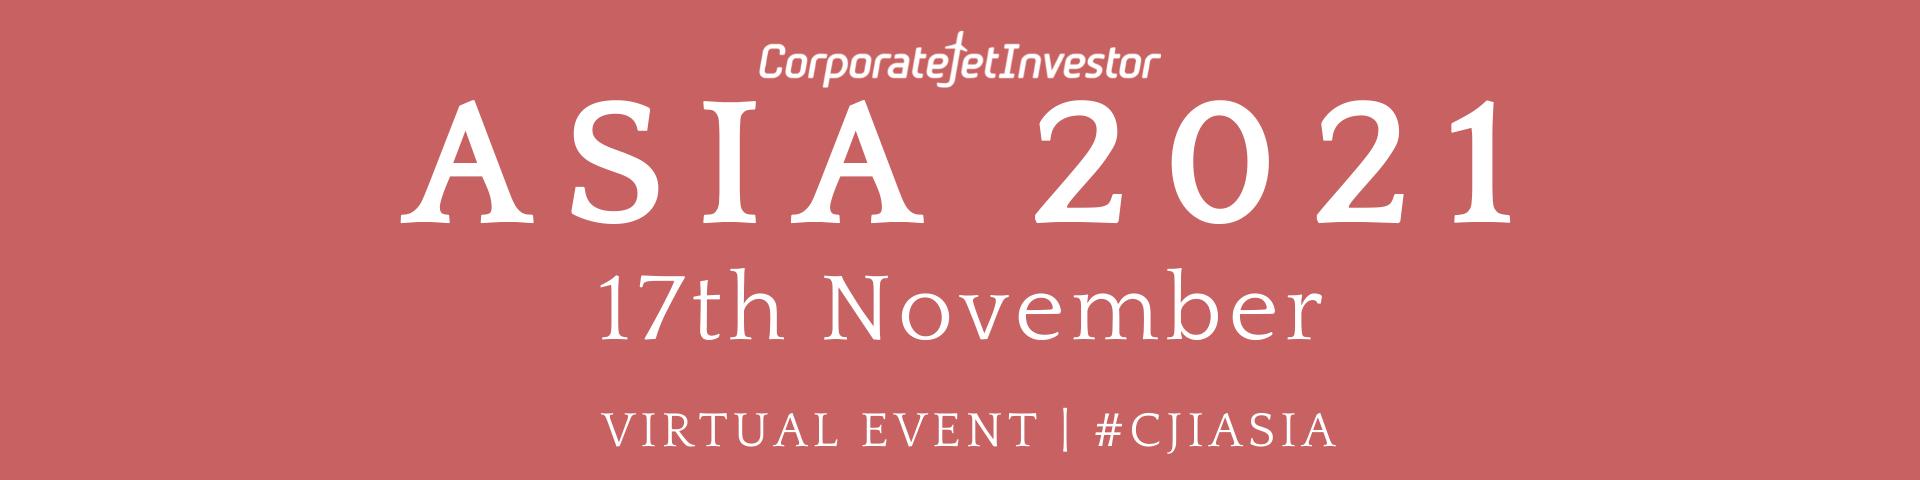 Corporate Jet Investor Asia 2021